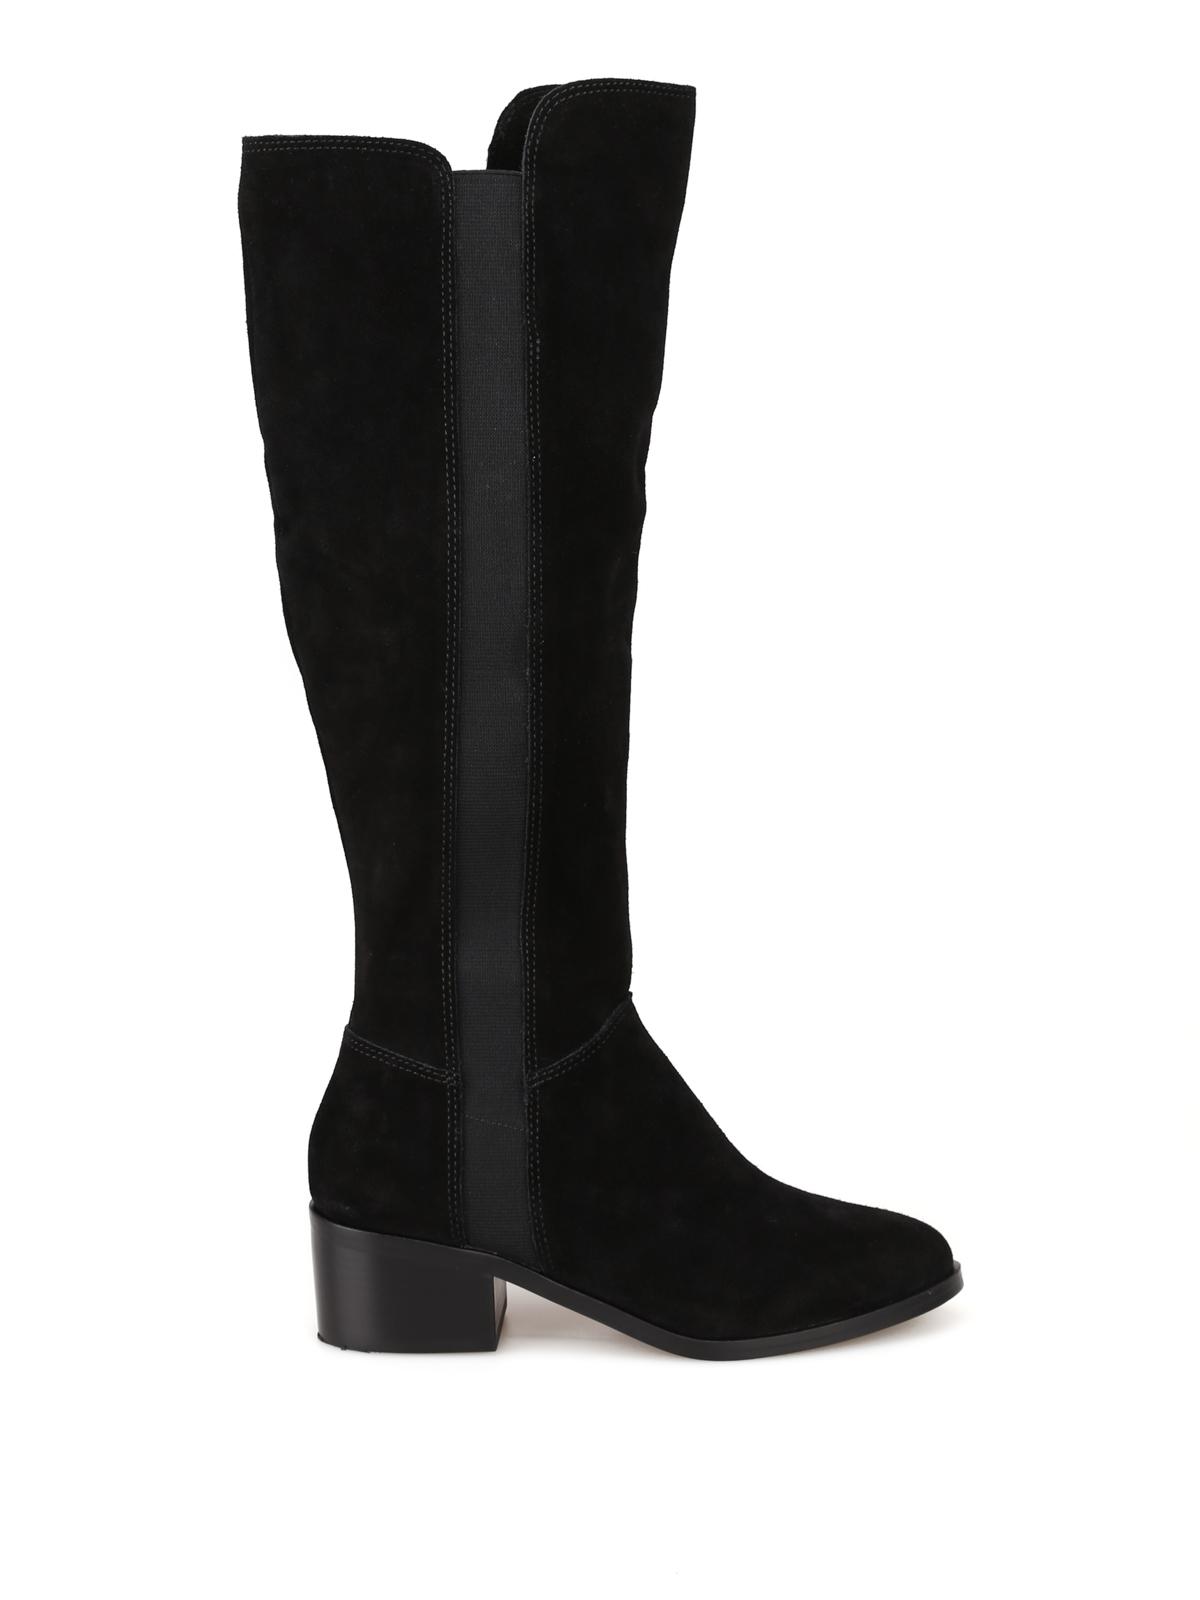 956ebaa1c48 Steve Madden - Giselle boots - boots - GISELLEBLACKSUEDE | iKRIX.com